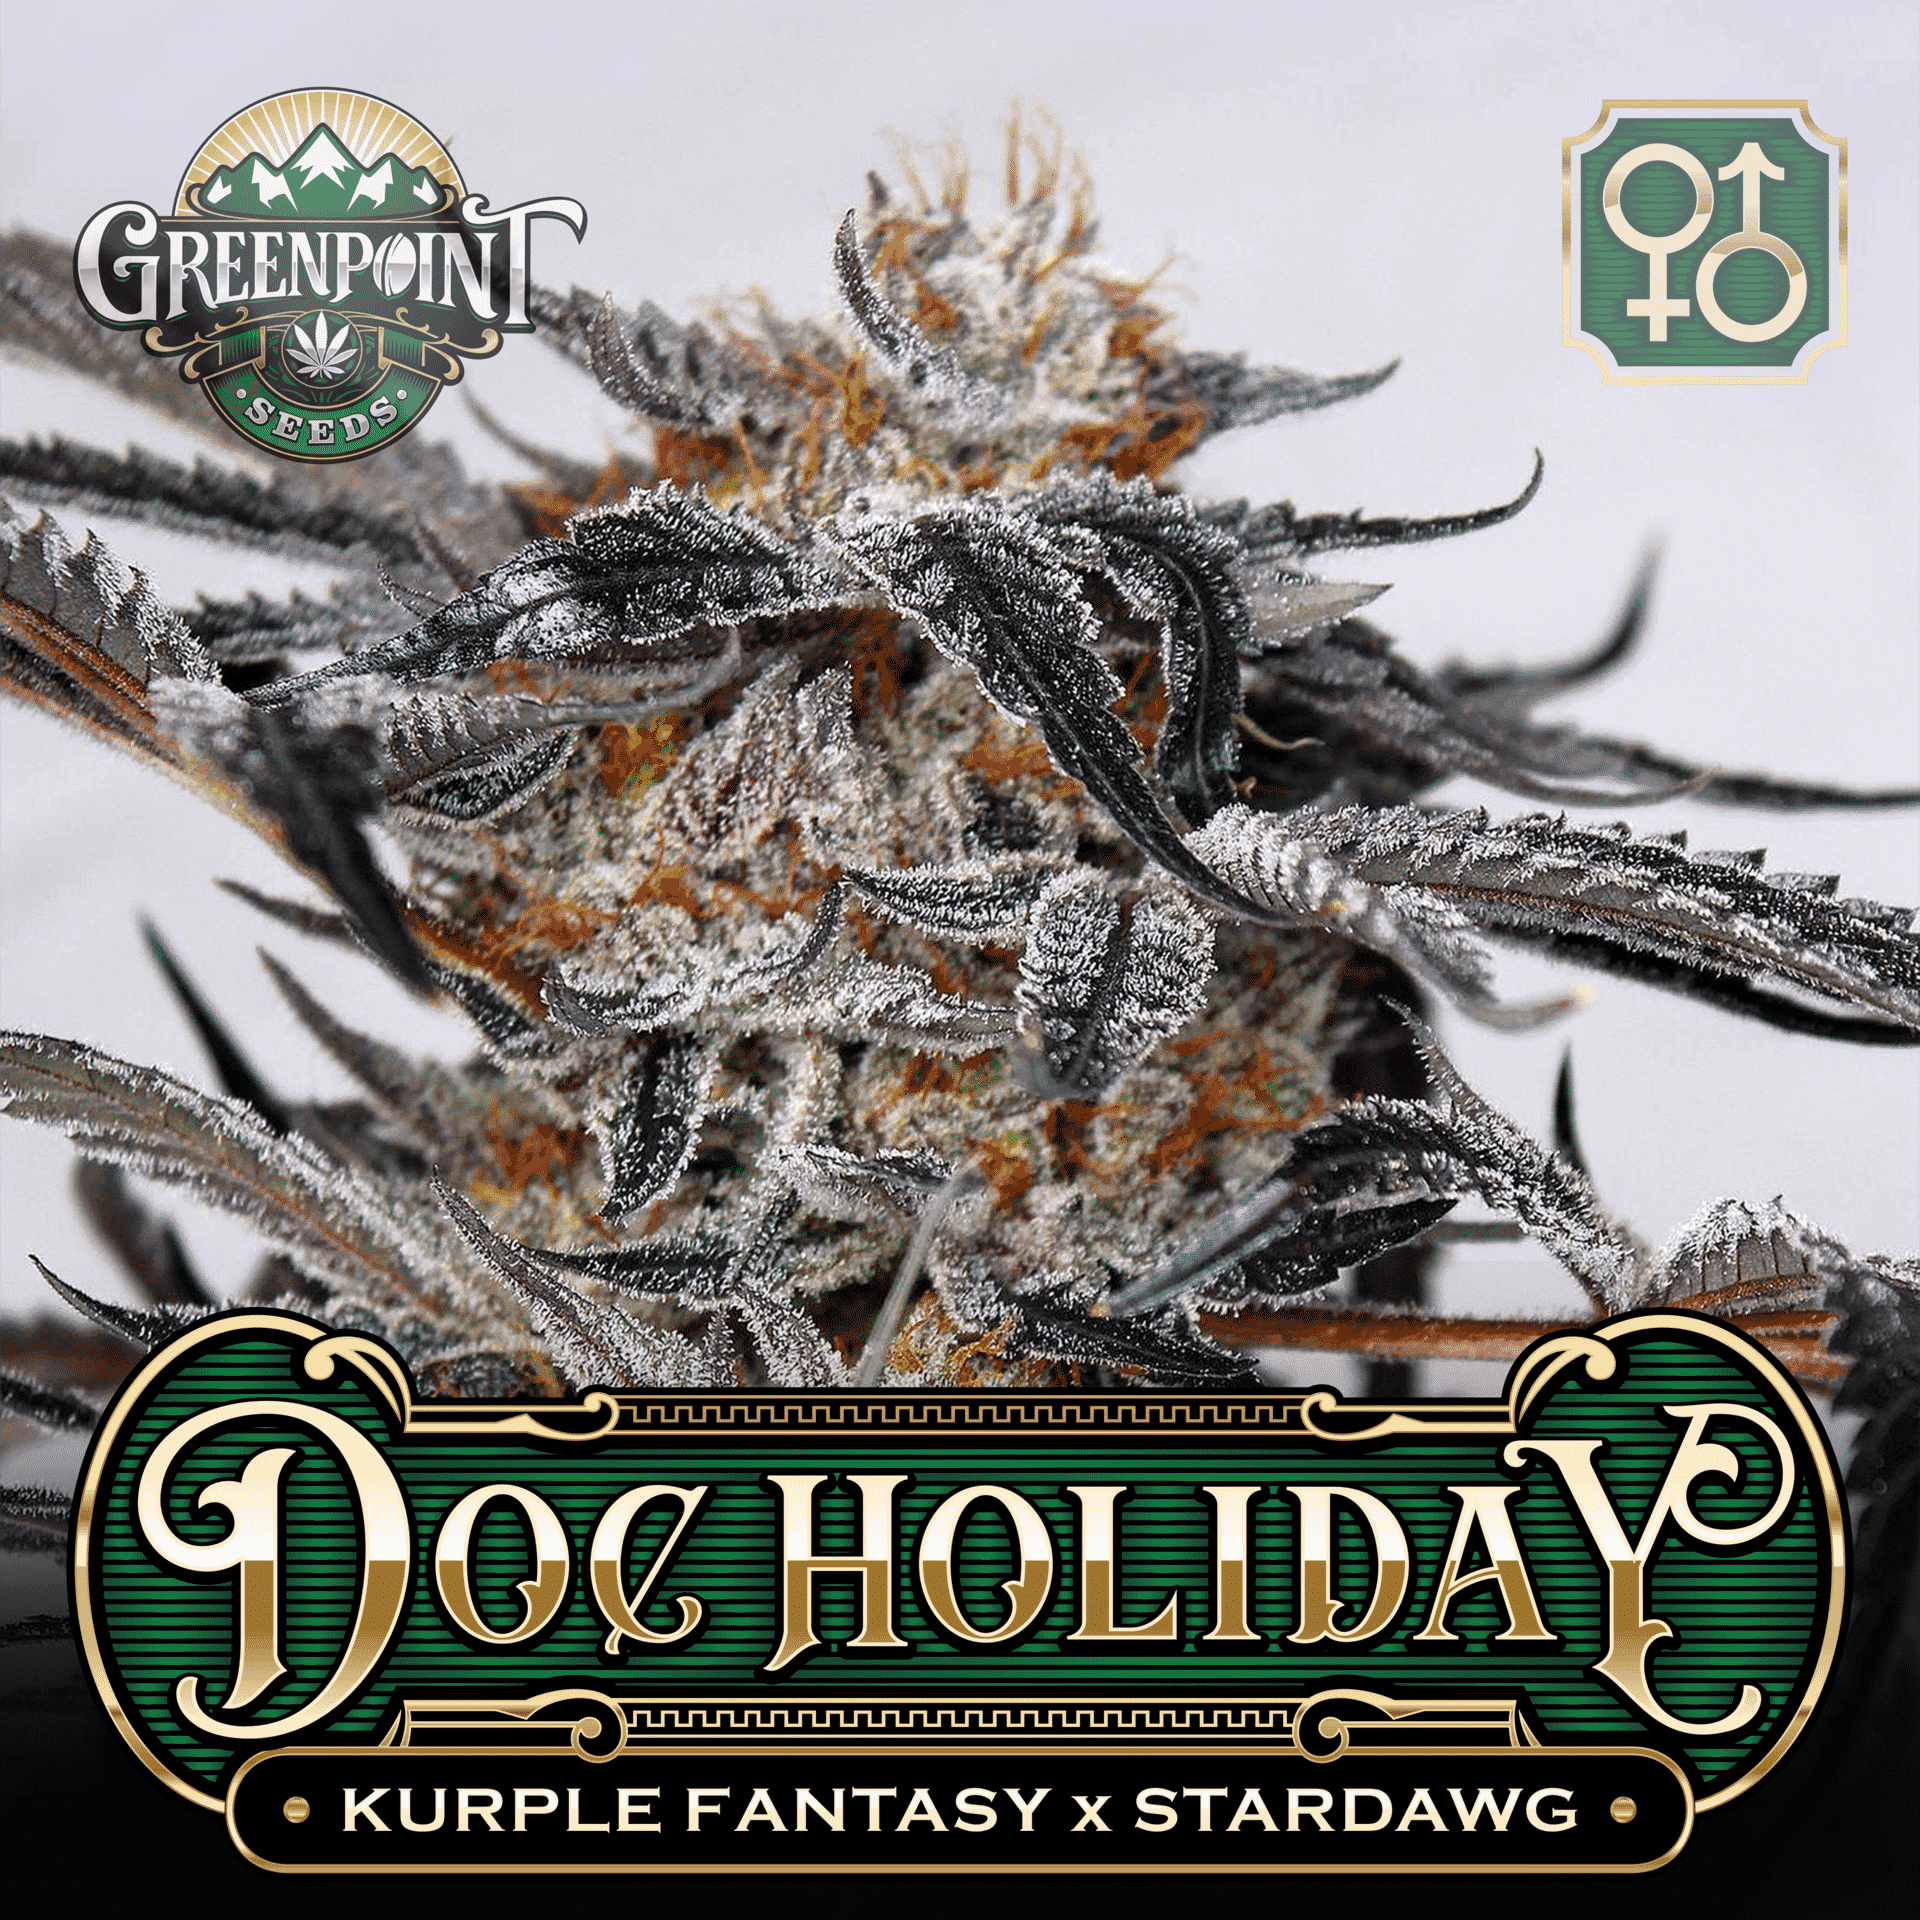 Doc Holiday Seeds - Kurple Fantasy x Stardawg | Greenpoint Seeds